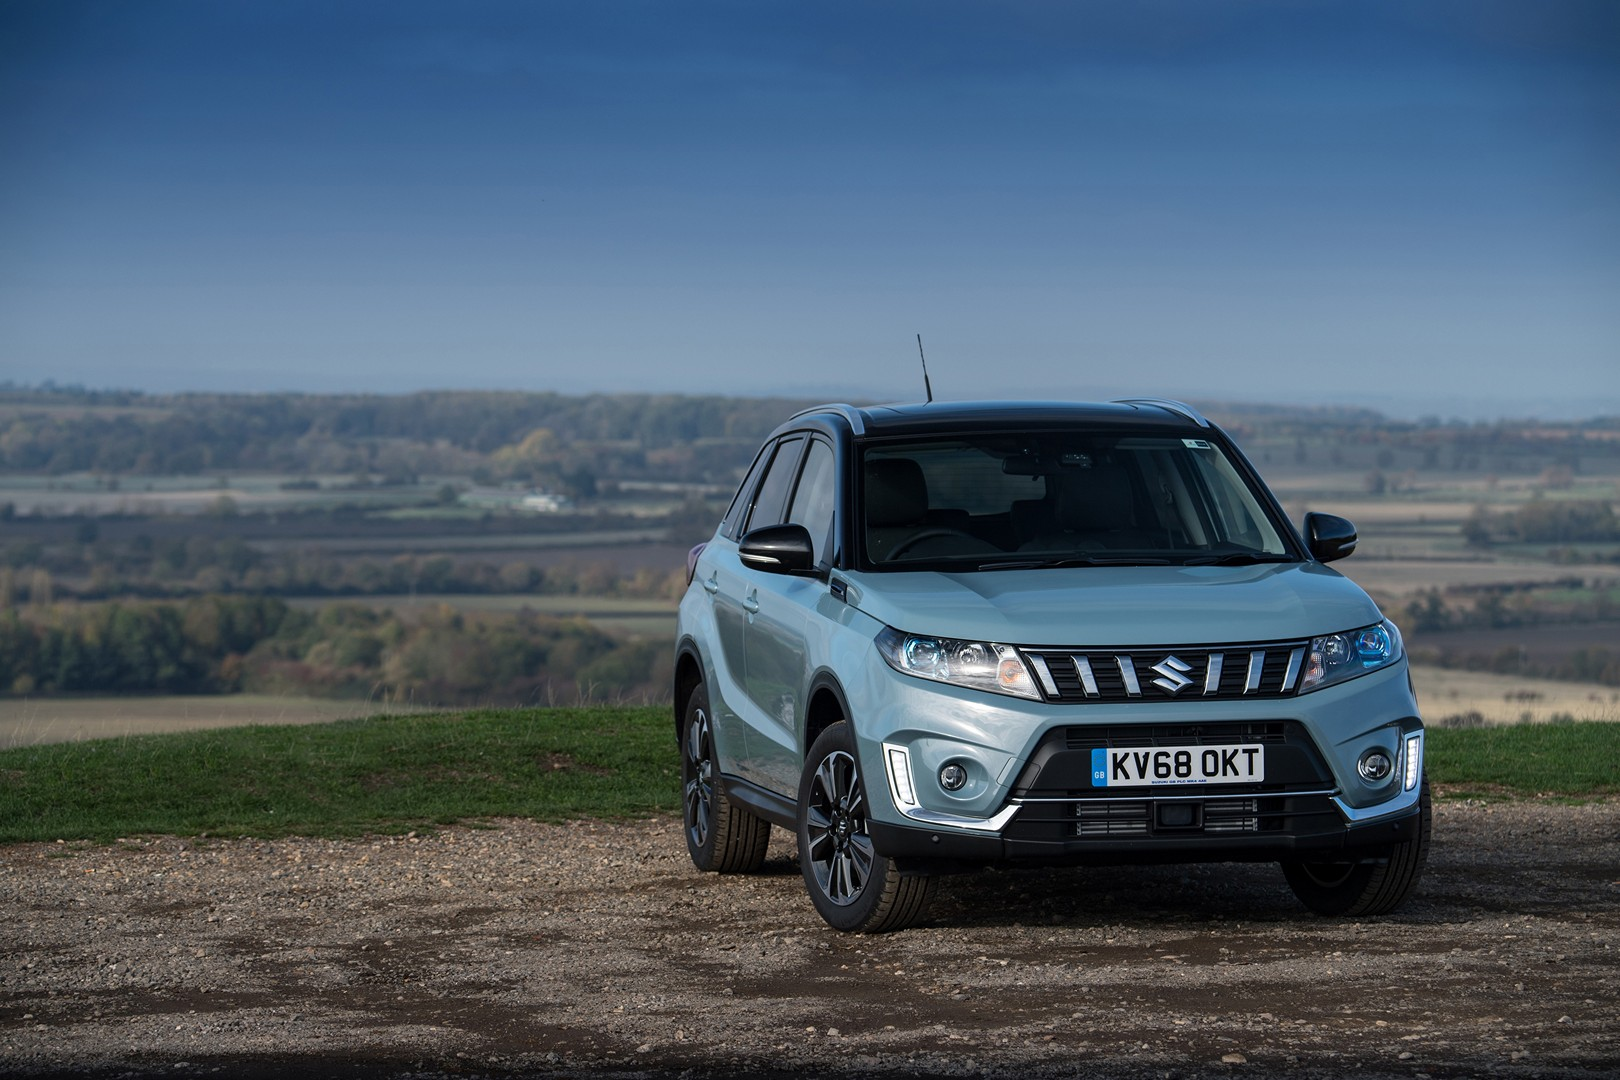 2019 Suzuki Vitara Launched in the UK from £16,999, Unveils Ice Greyish Blue - autoevolution